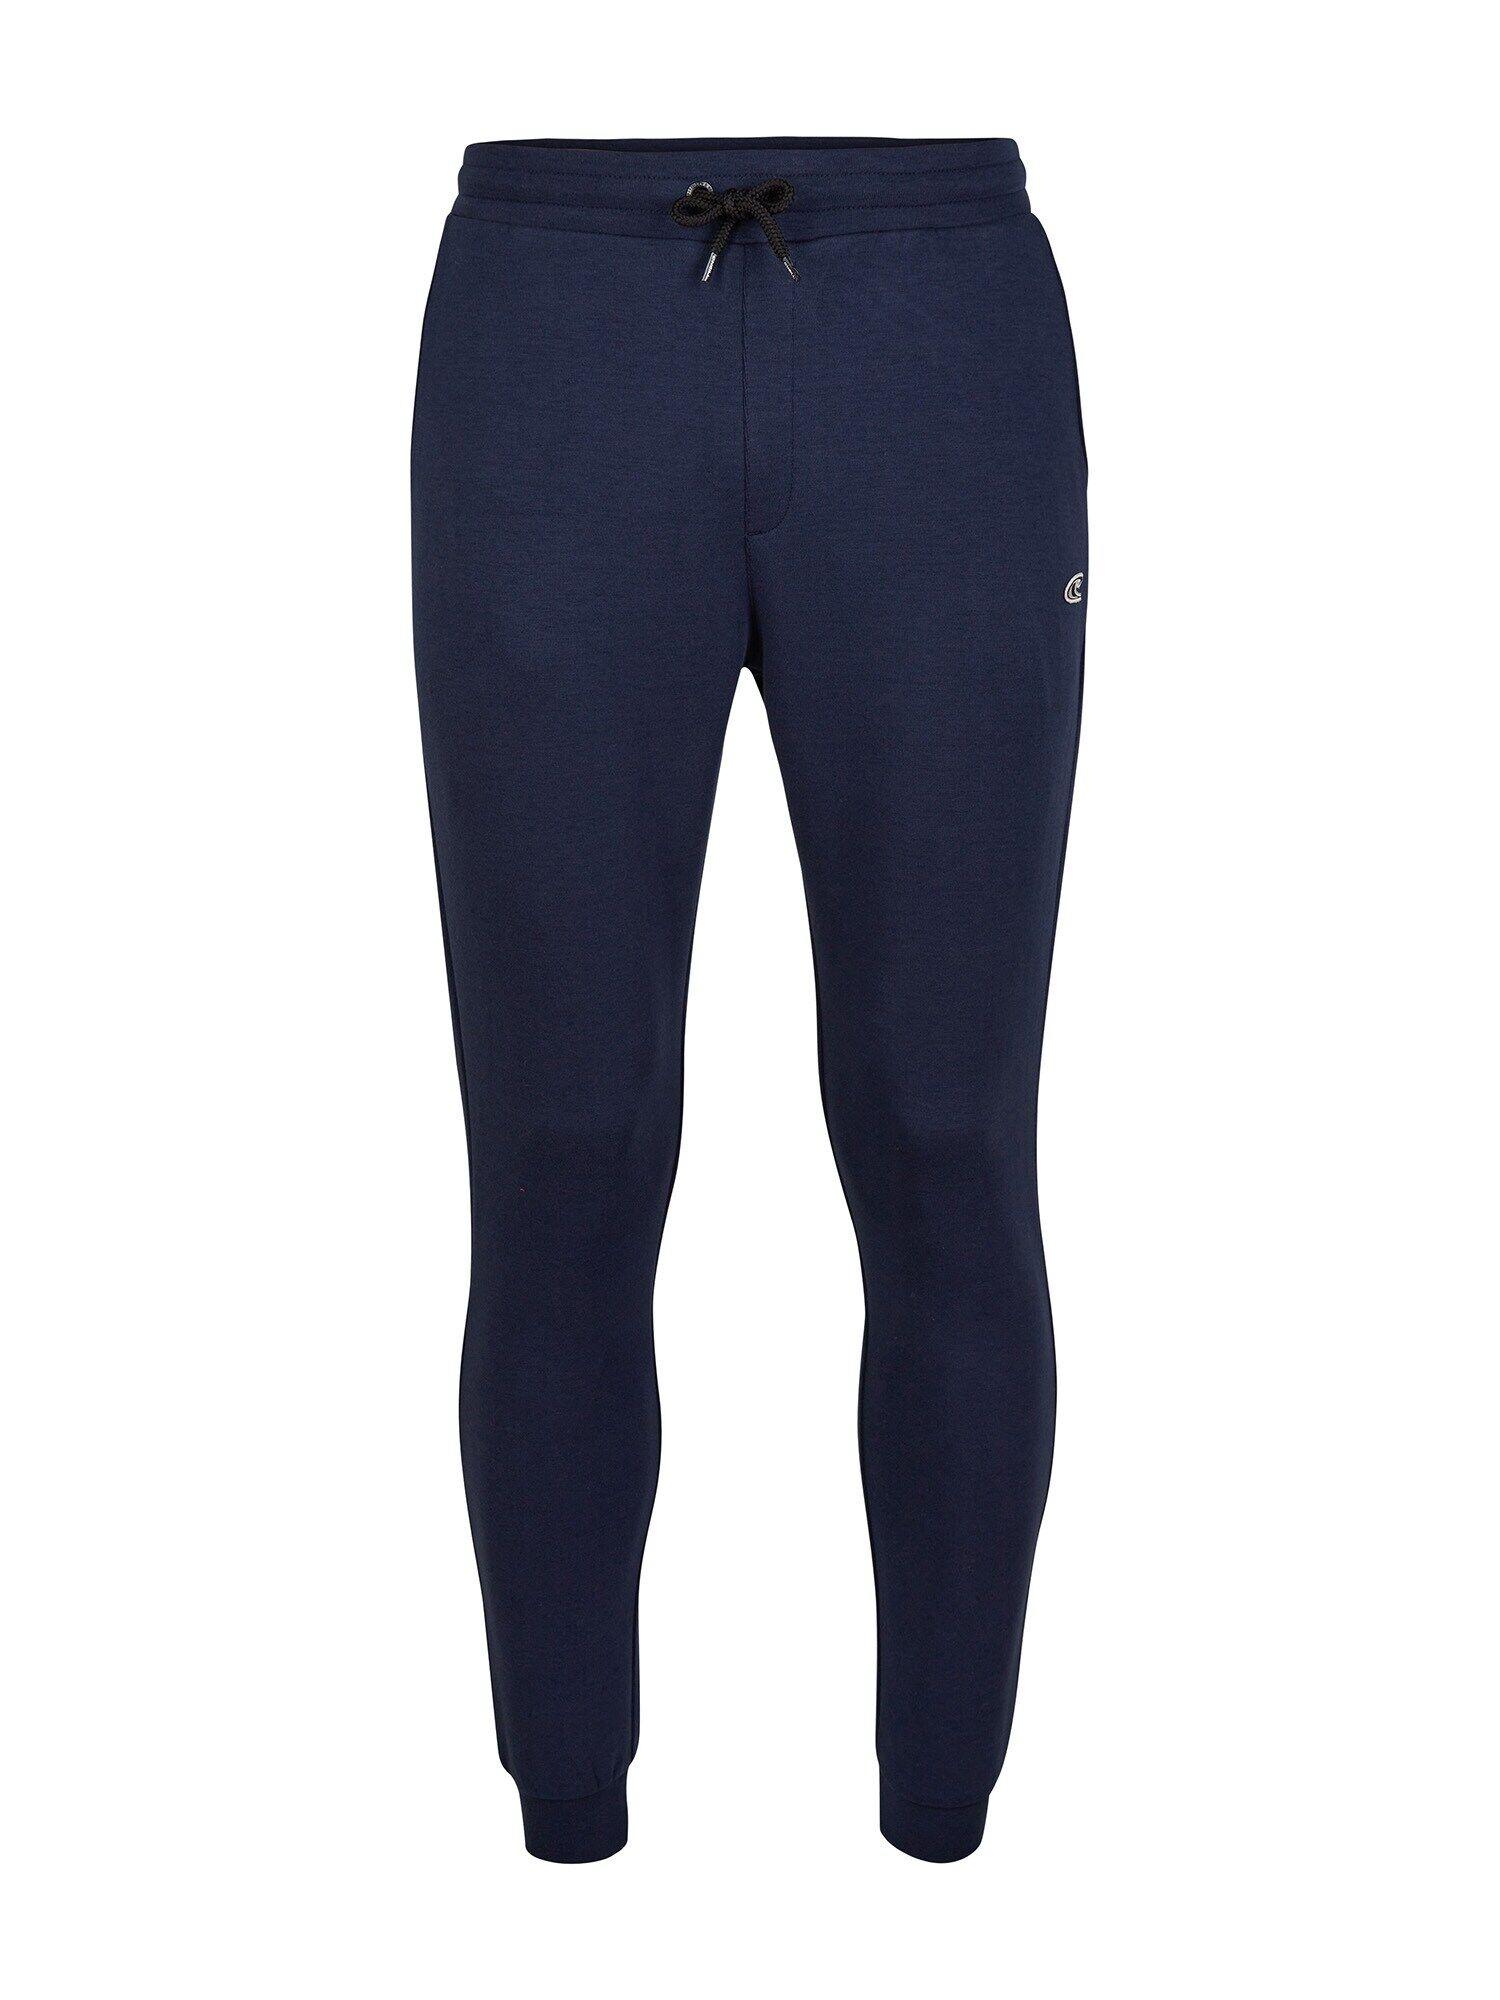 O'NEILL Pantalon 'Transit'  - Bleu - Taille: L - male